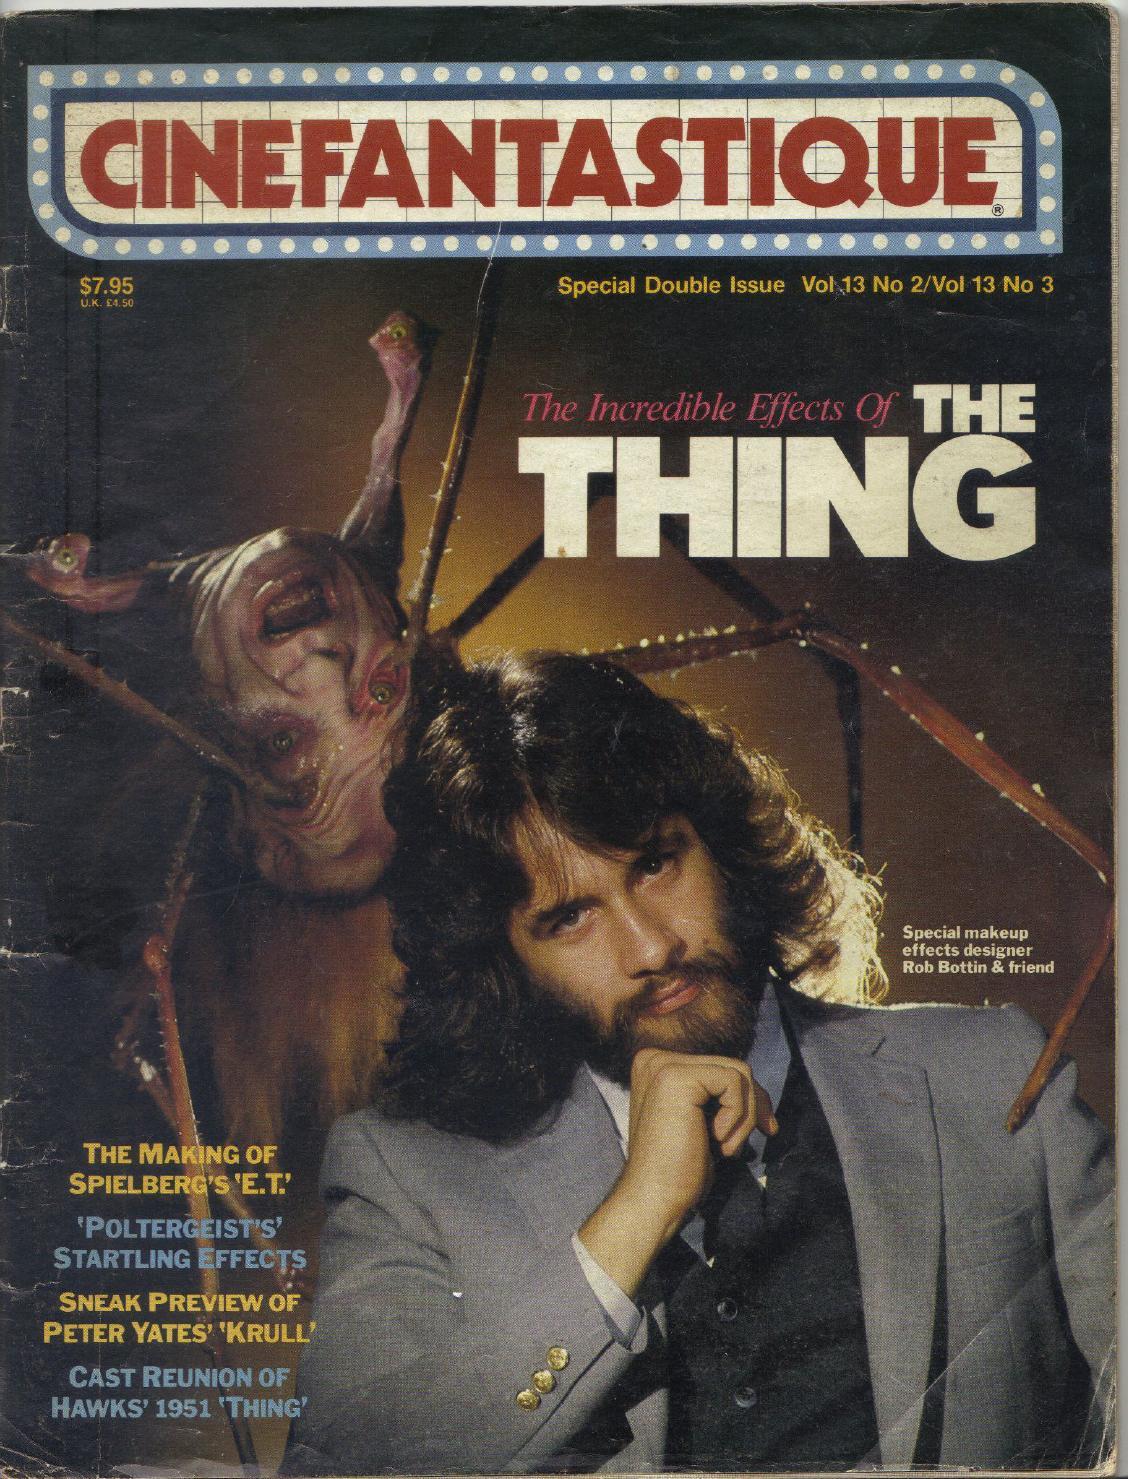 Rob Bottin on the cover of Cinefantastique magazine